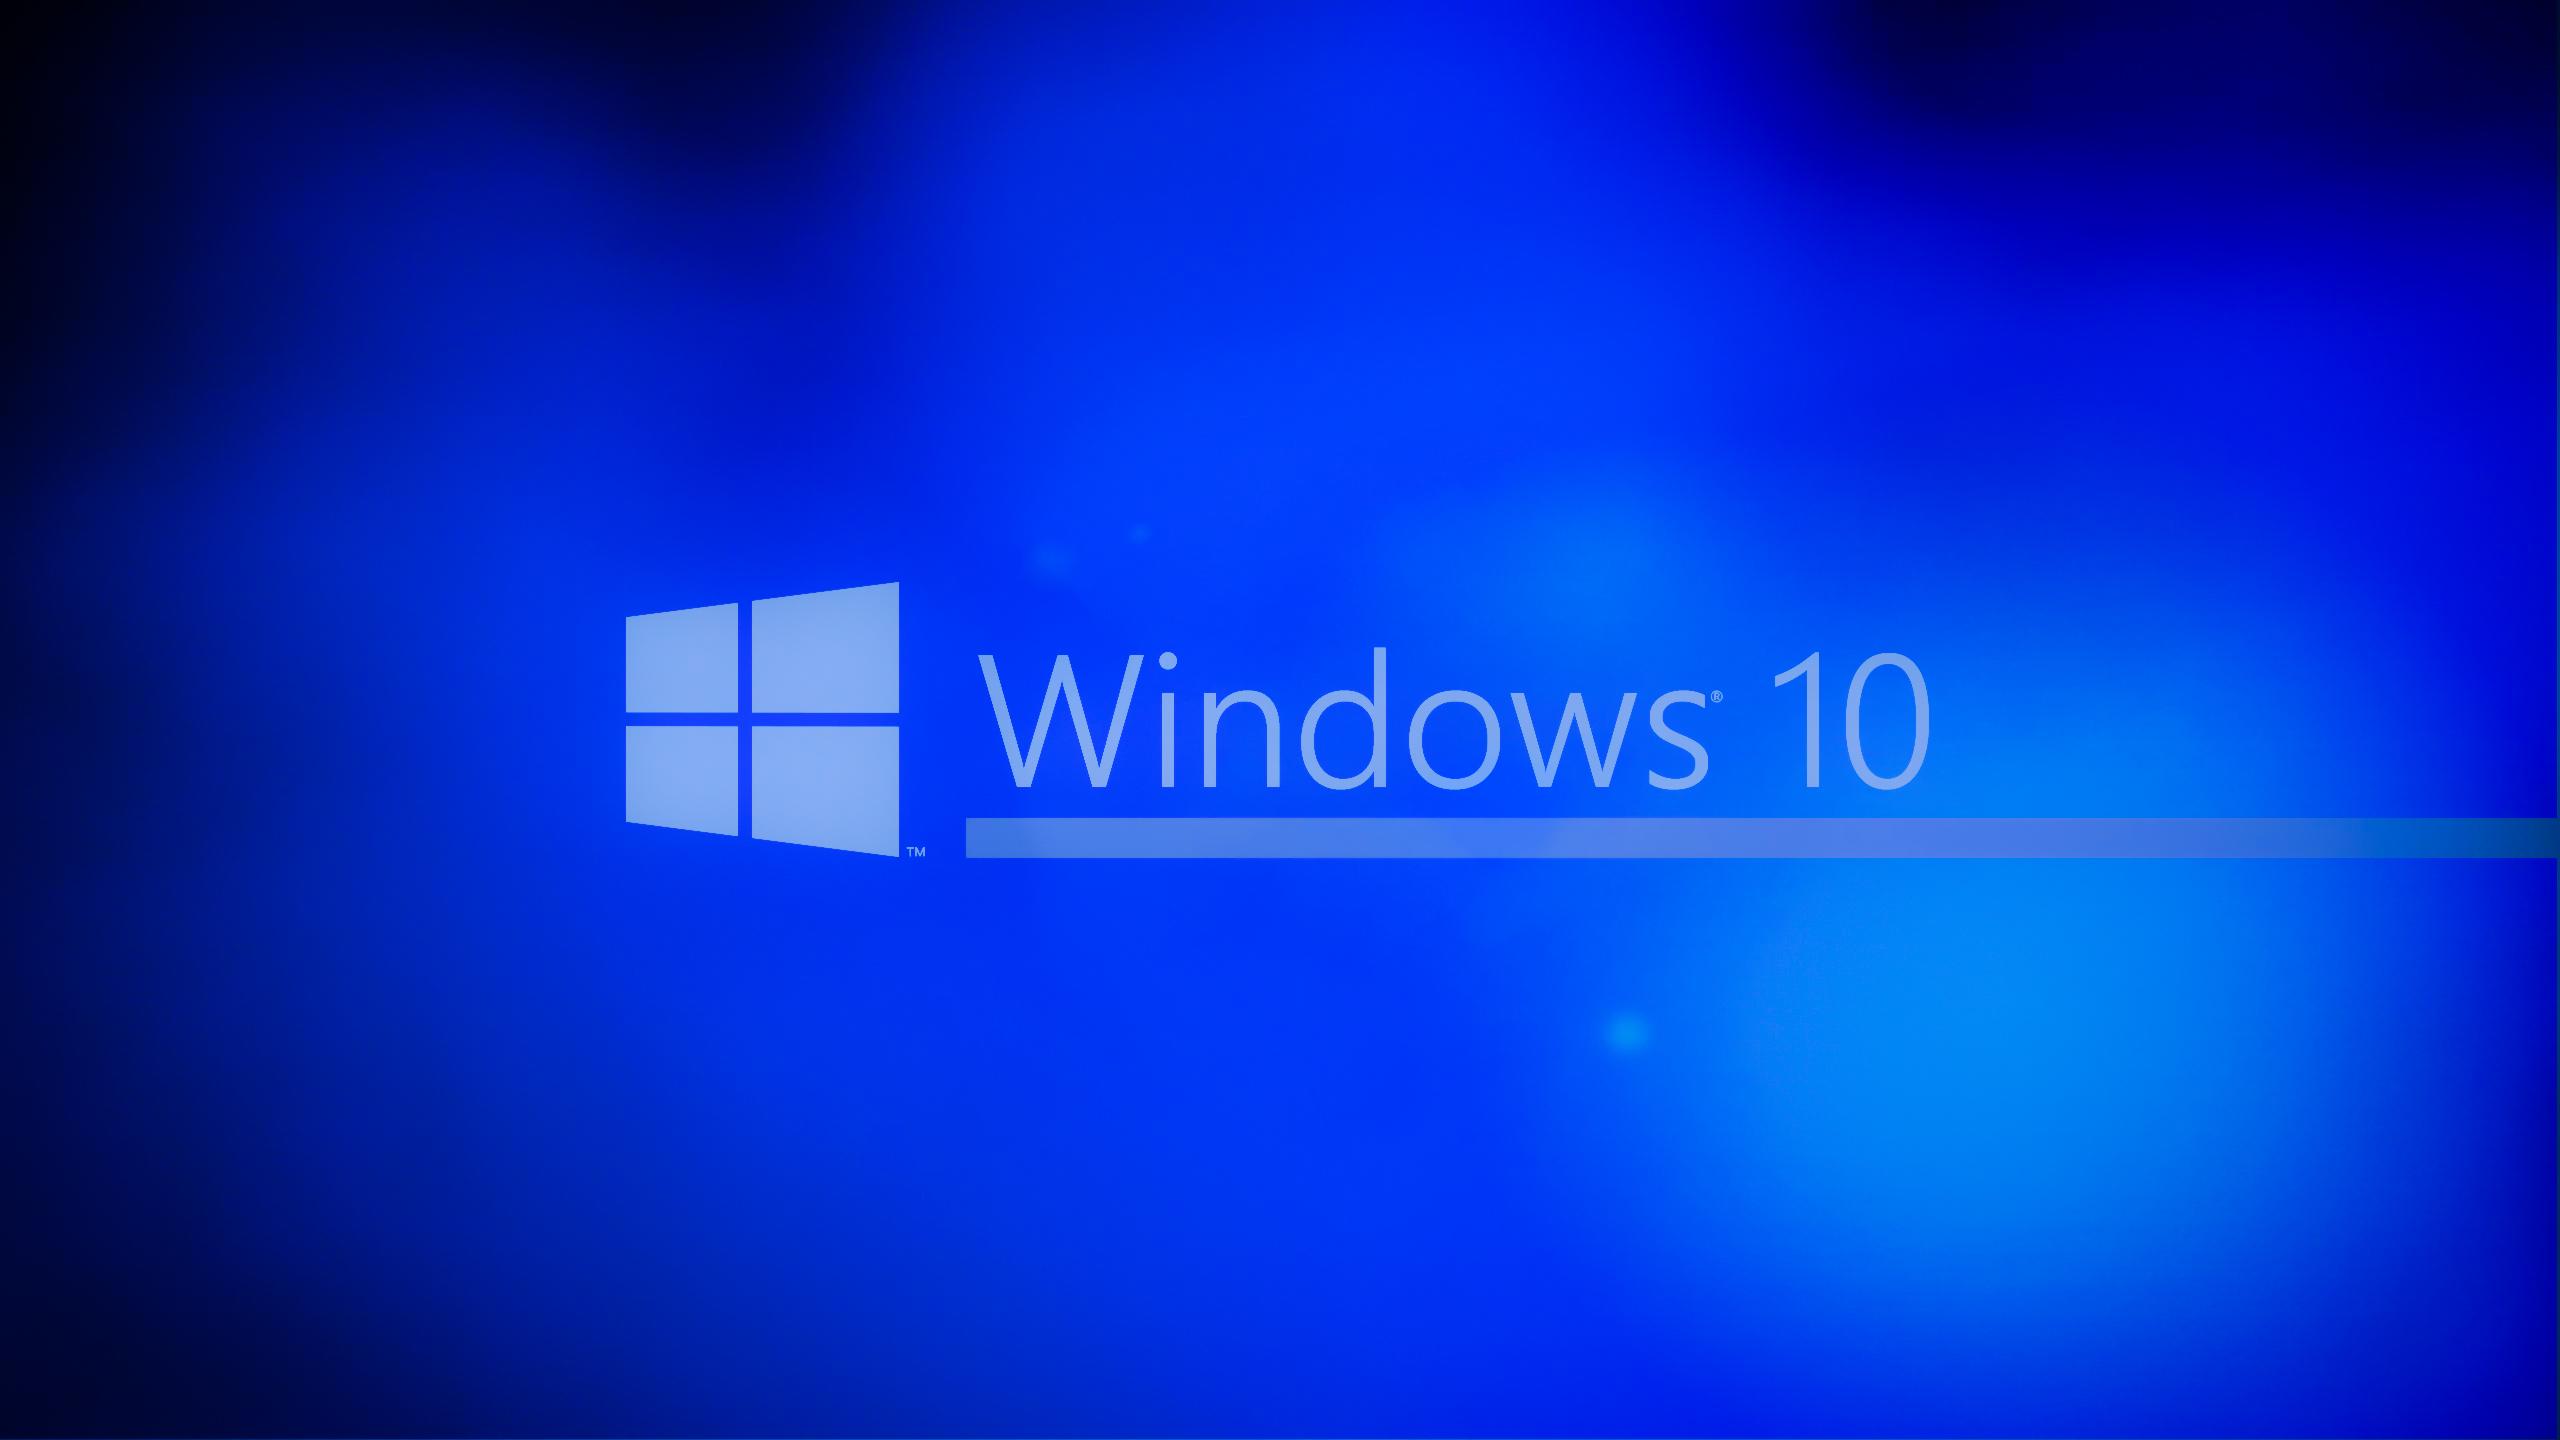 Windows 10 Wallpaper Logo Start   HD Wallpapers Ultra HD Wallpapers 2560x1440